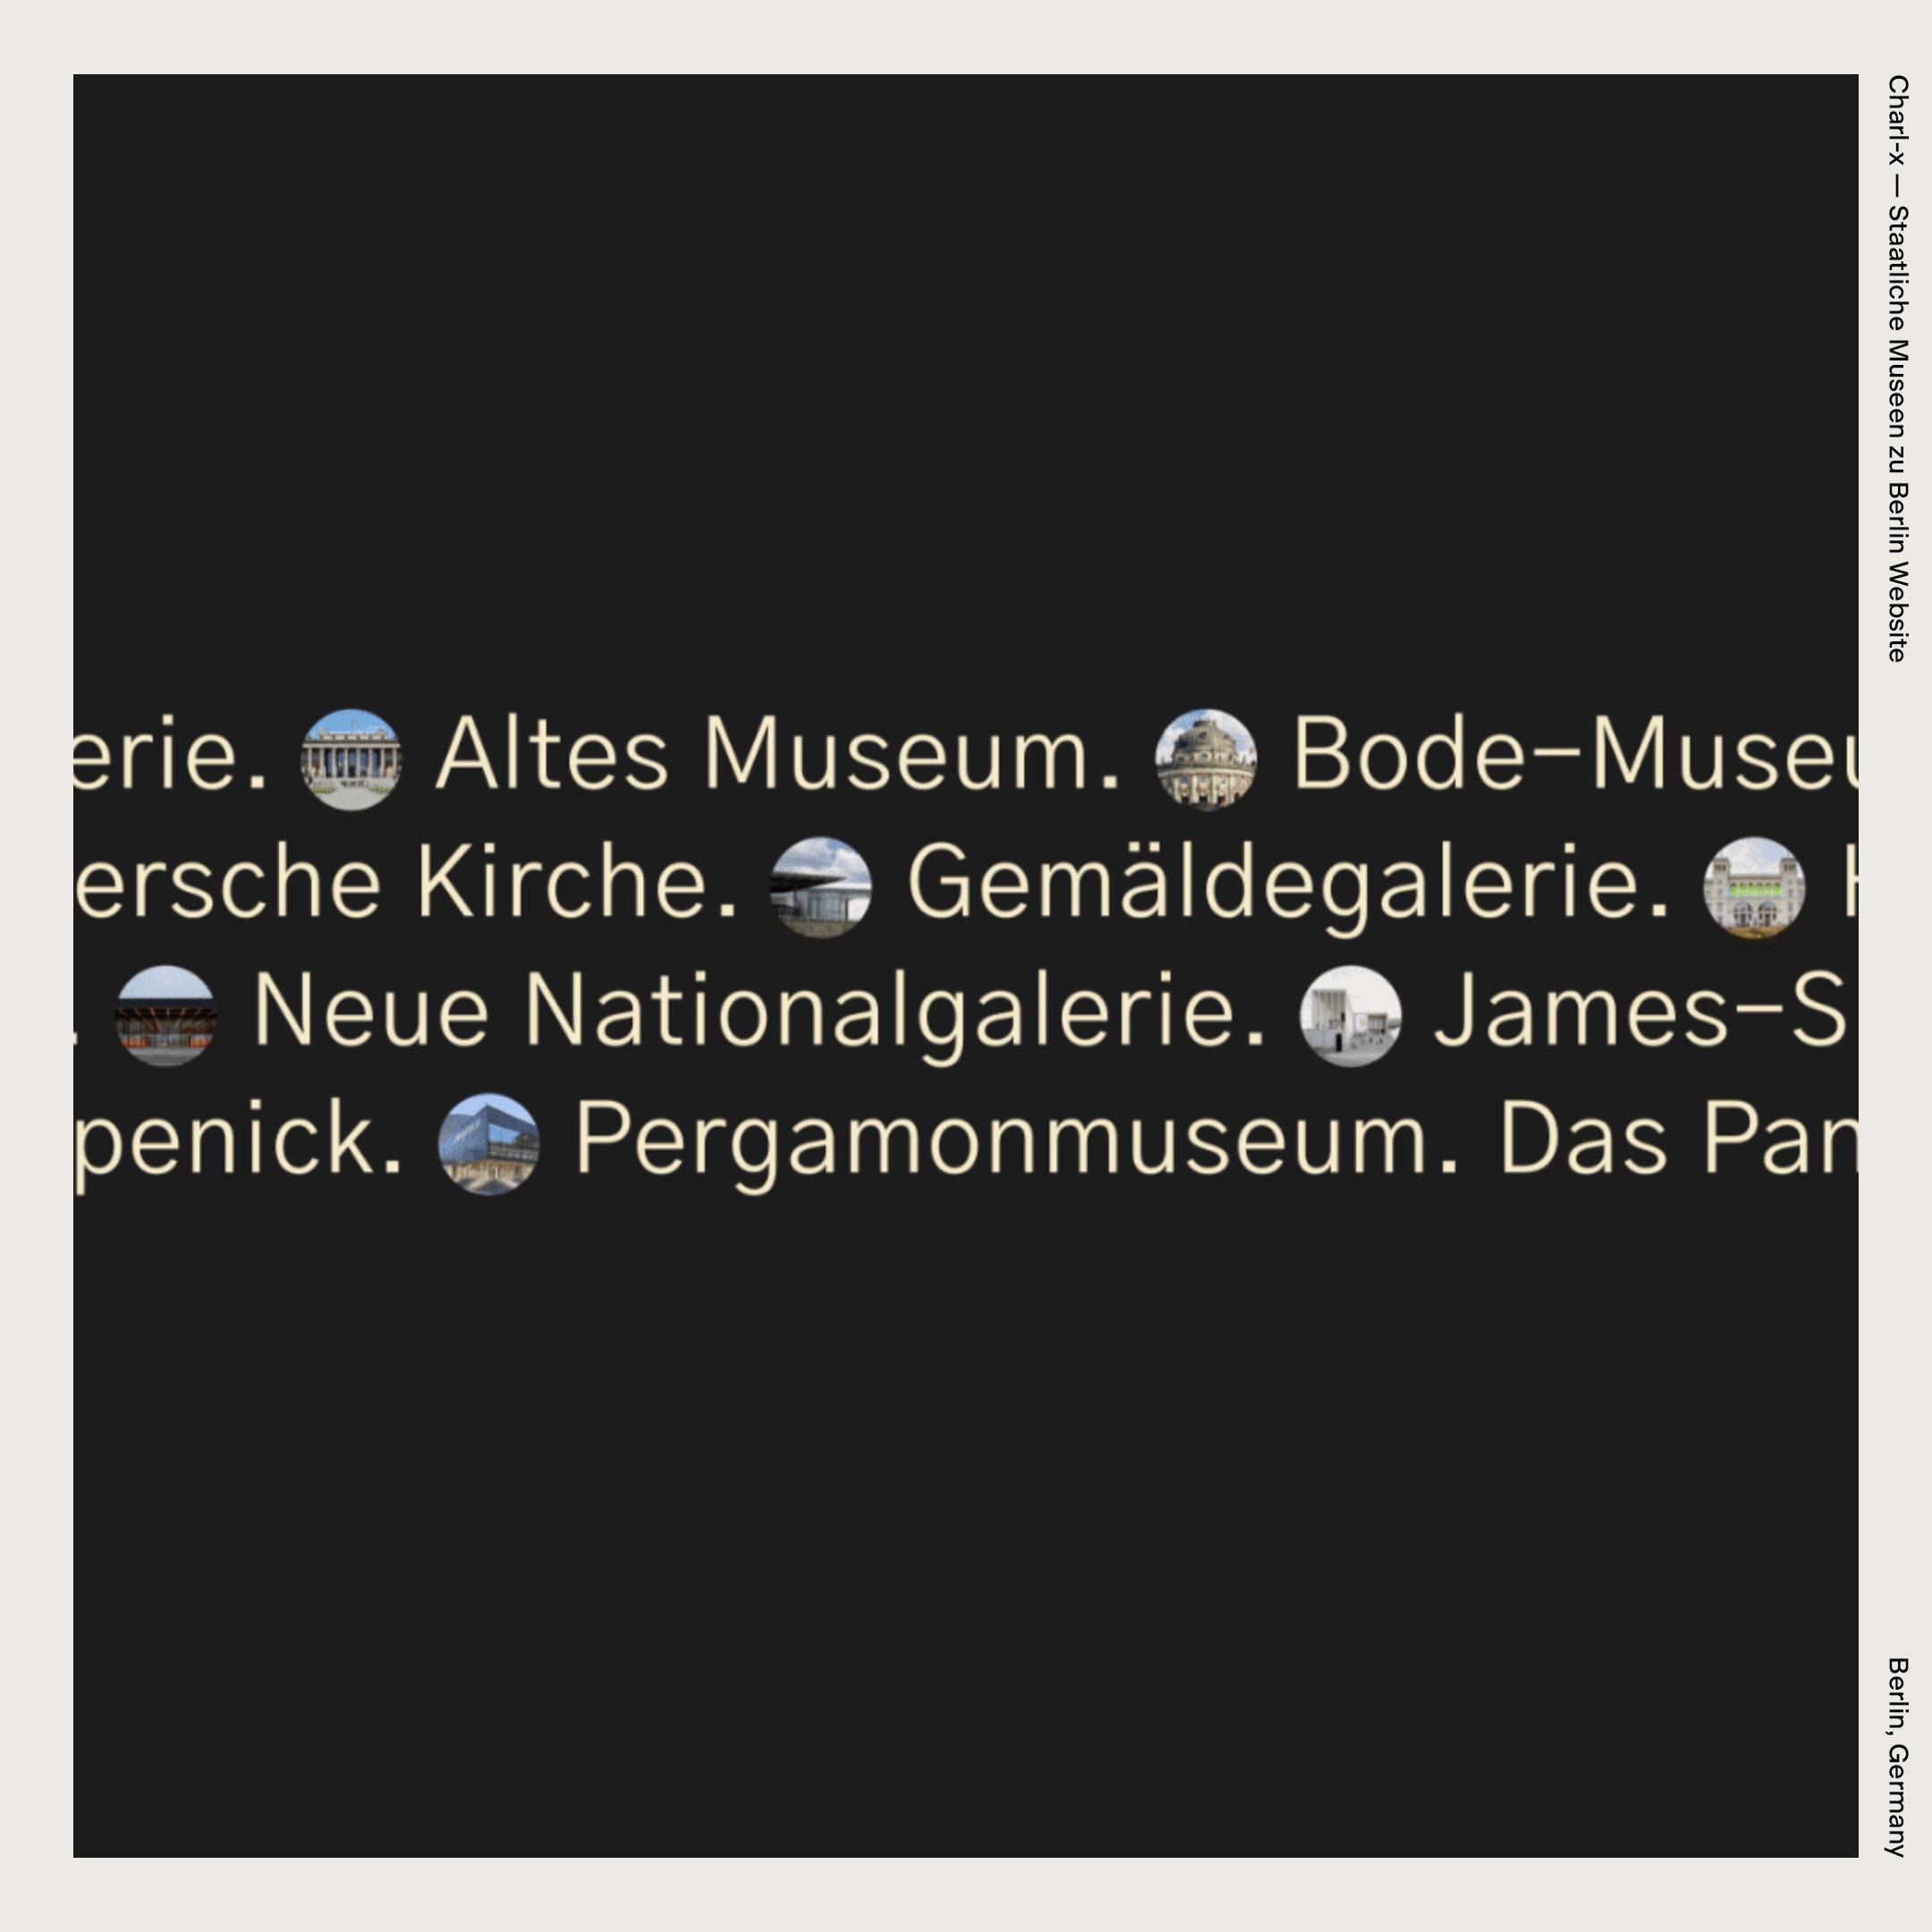 Charl-x — Staatliche Museen zu Berlin Website